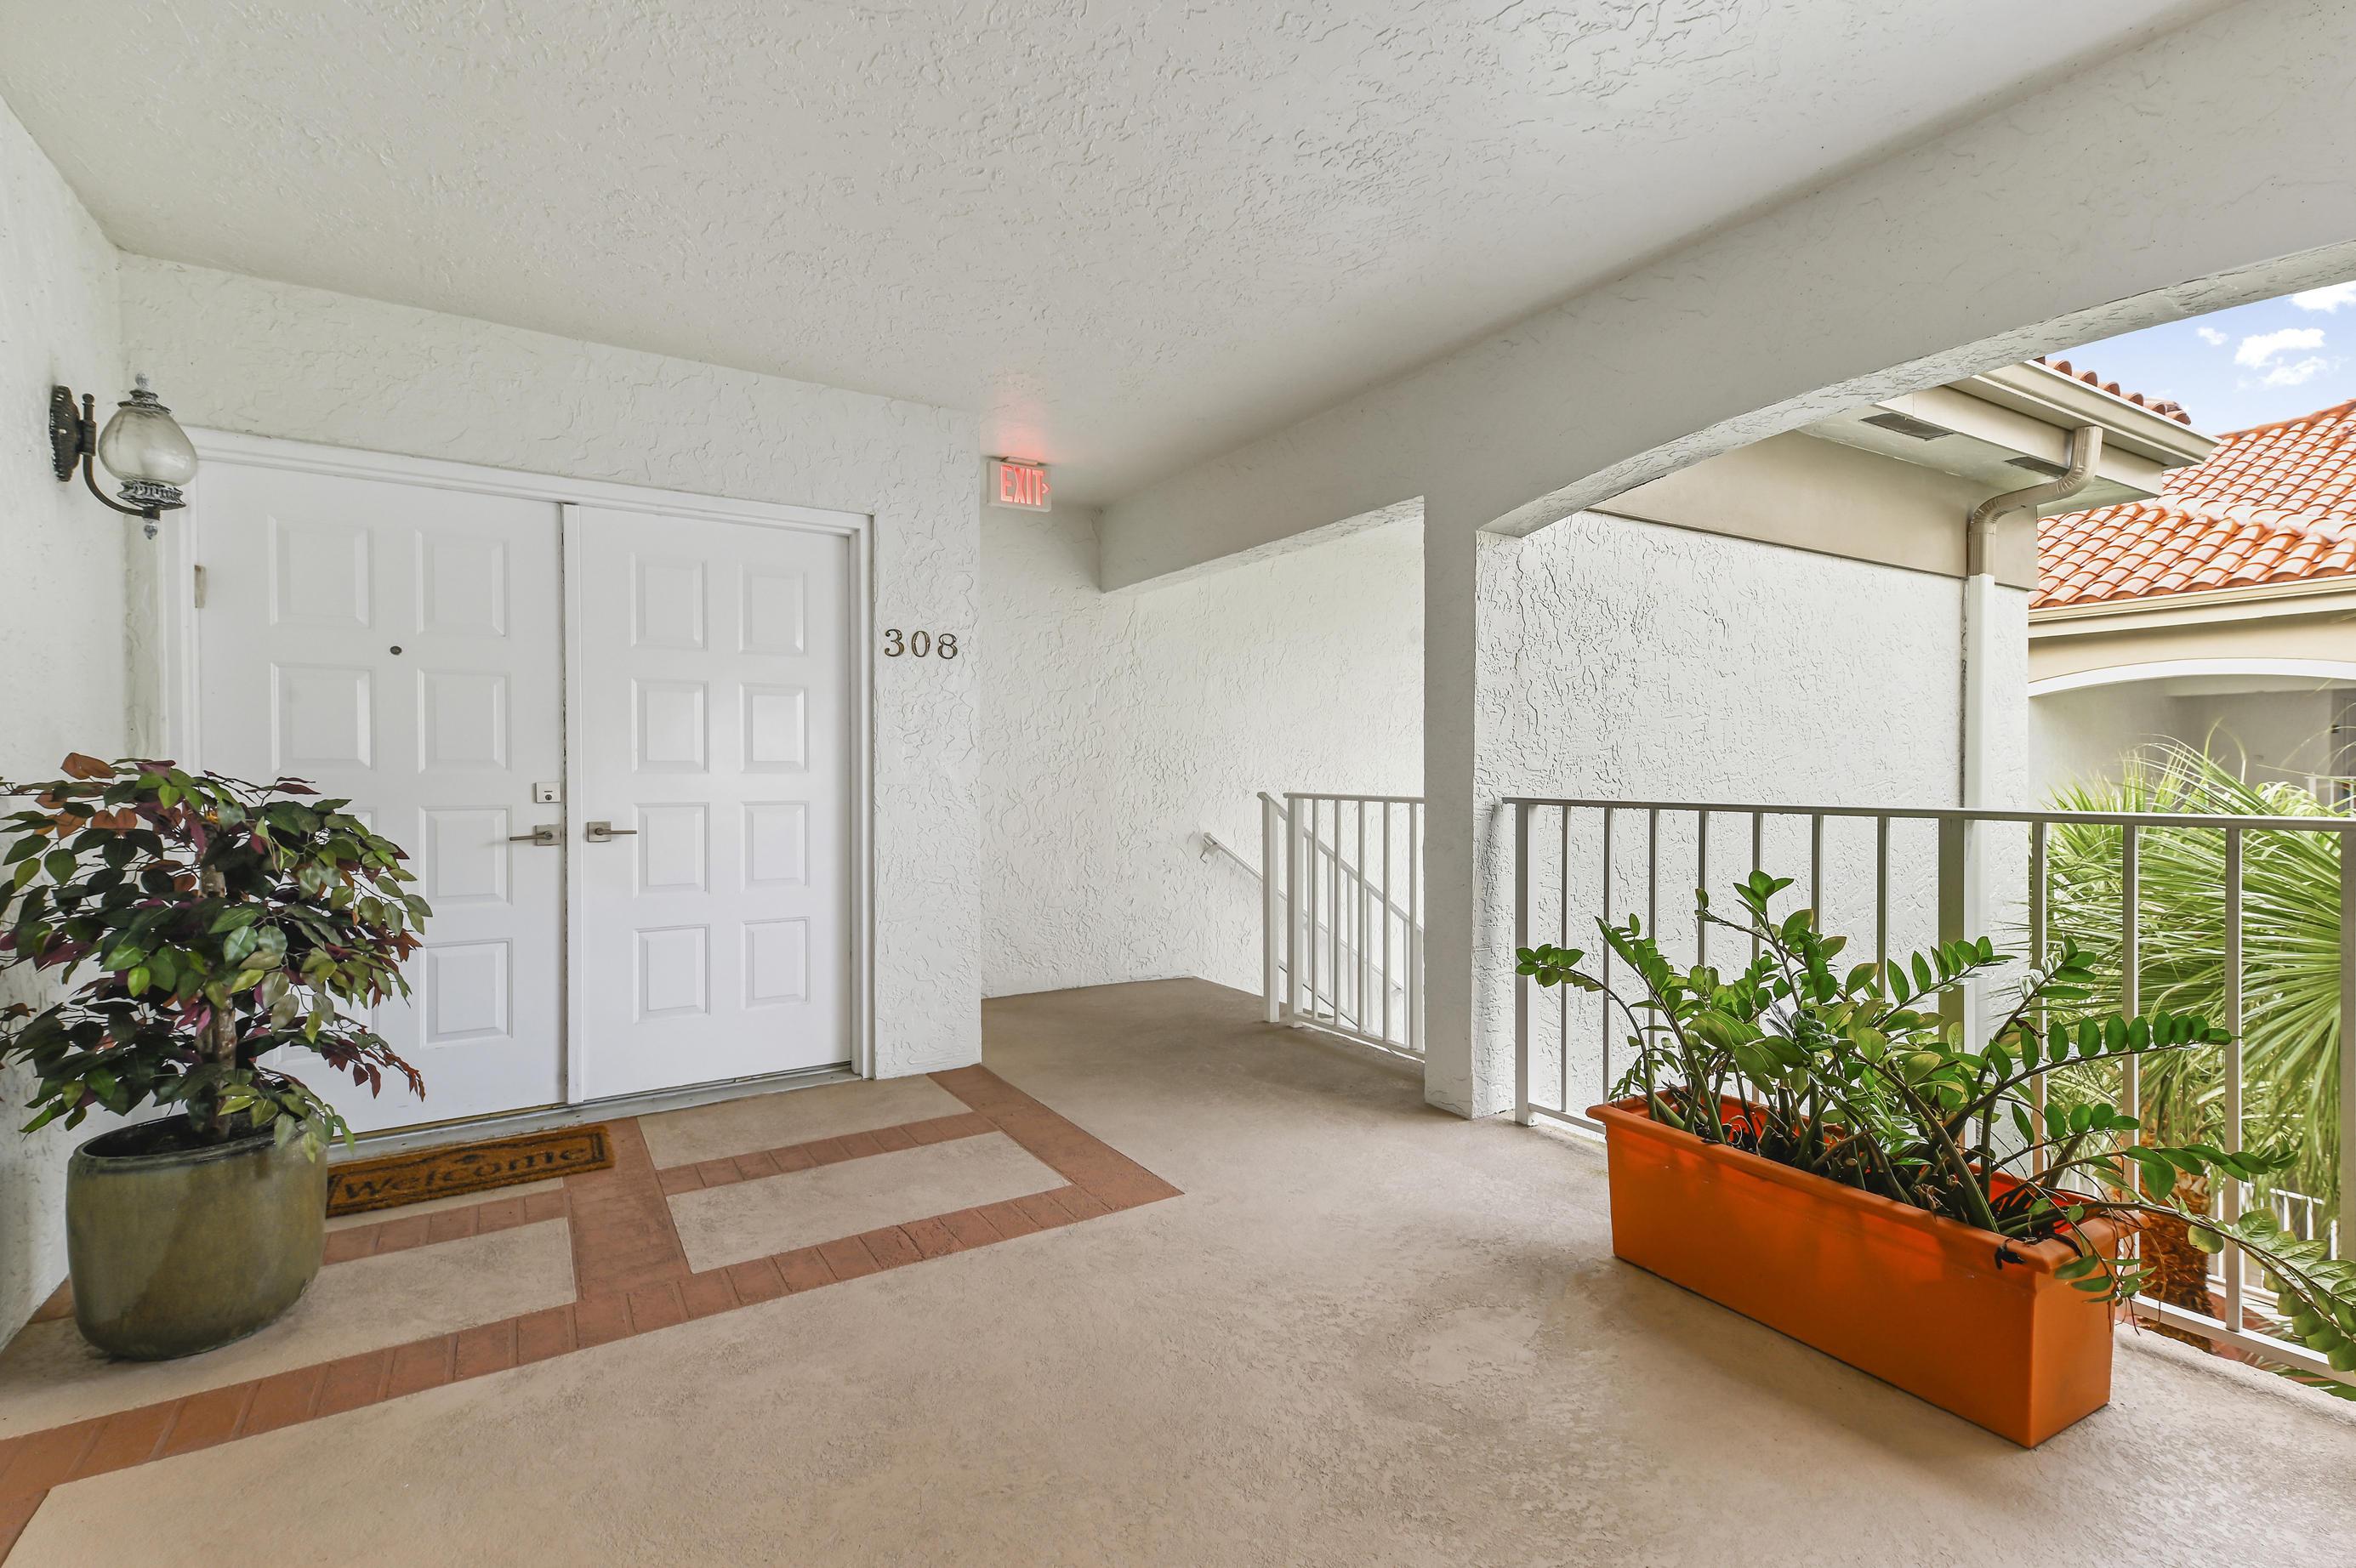 7369 Orangewood Lane 308-D, Boca Raton, FL 33433